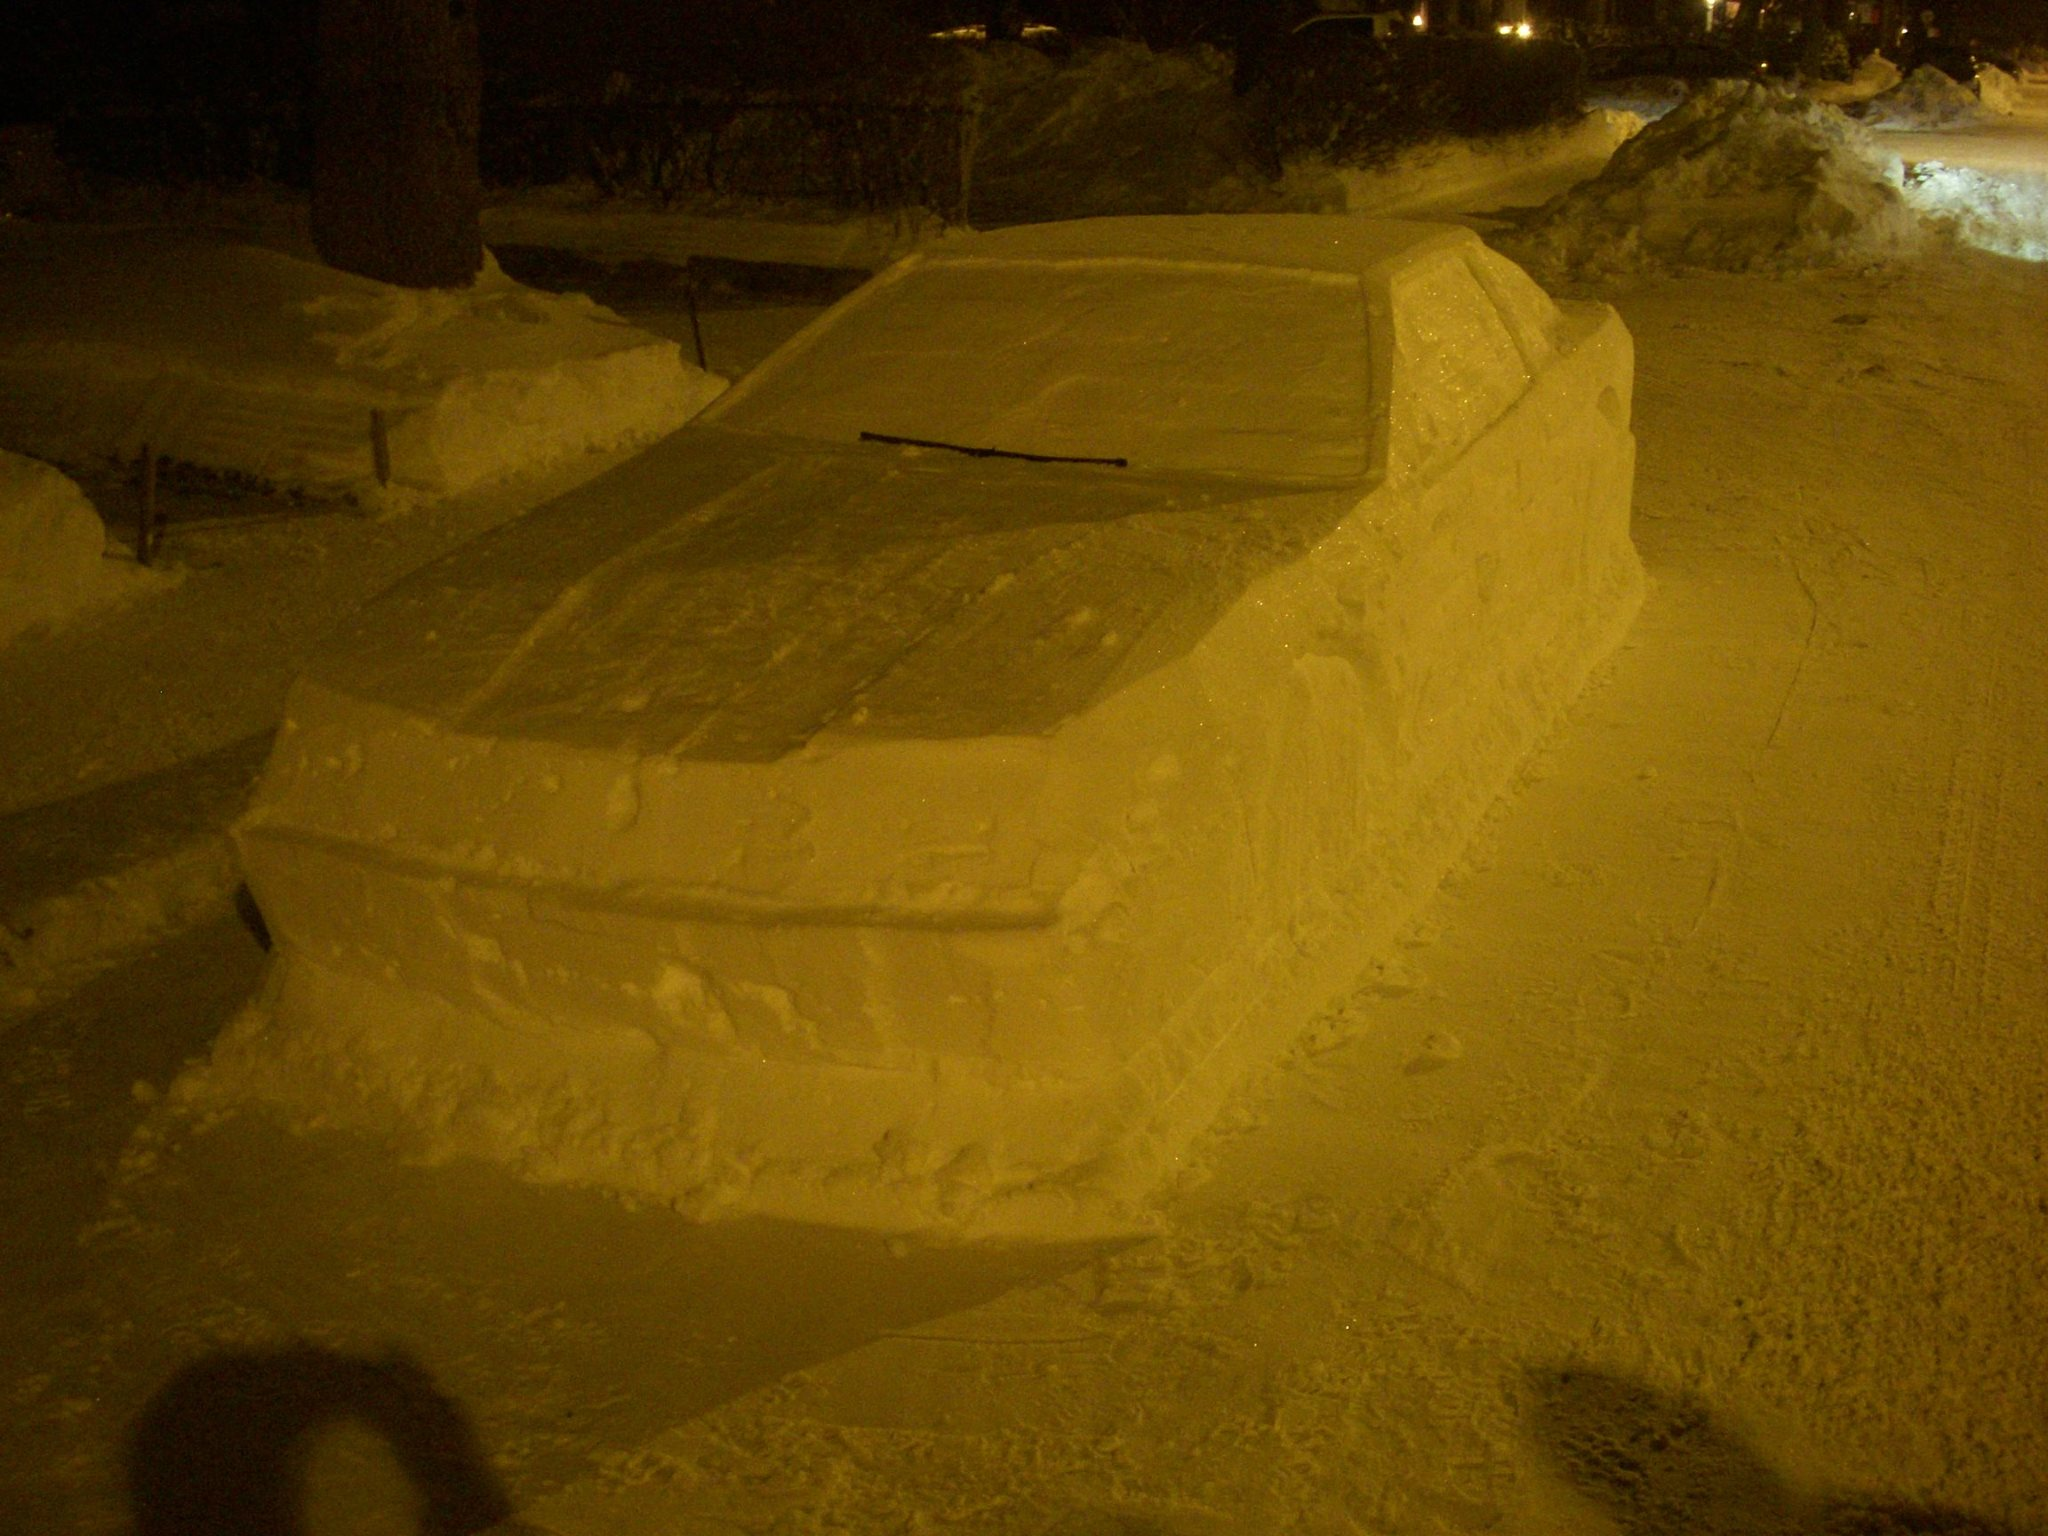 Toyota Supra snow (2)